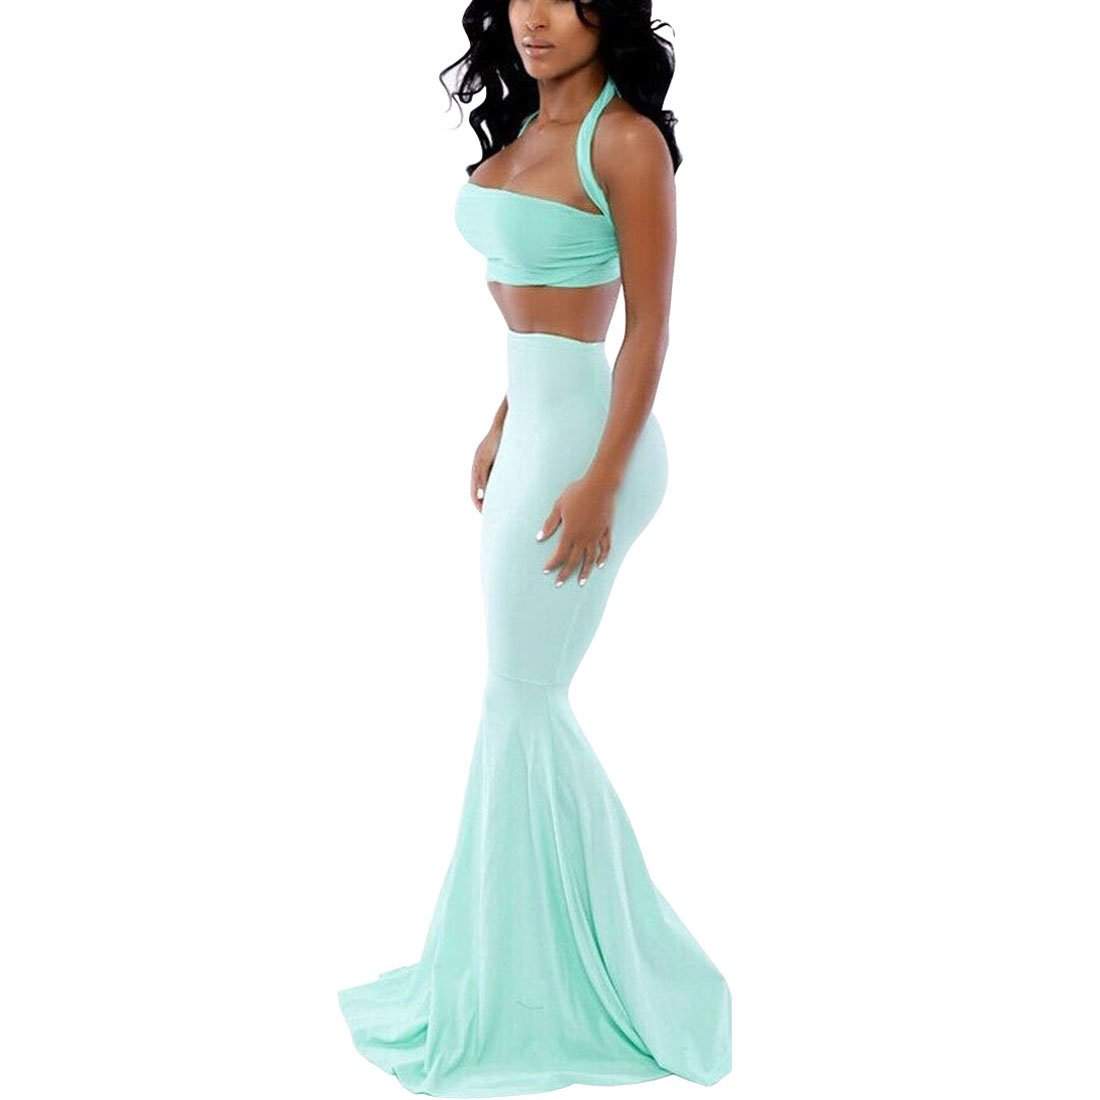 Women Halter Crop Top with Mermaid Maxi Skirt,mint green,M,OP53994